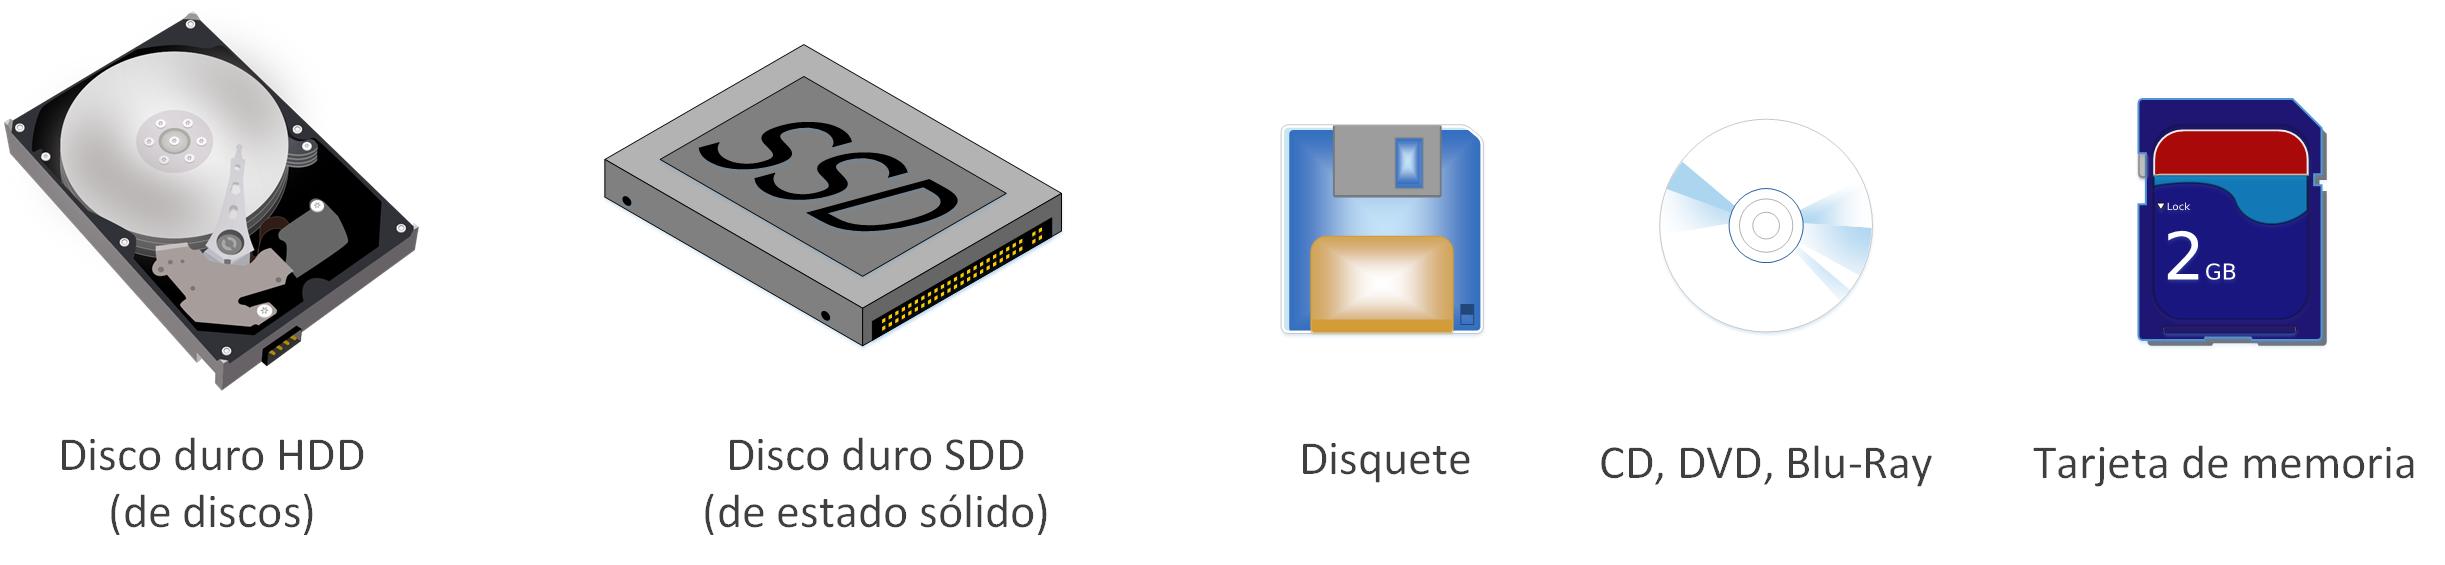 Imagen de Disco duro HDD, disco duro SDD, disquete, CD, DVD, Blu-ray, tarjeta de memoria